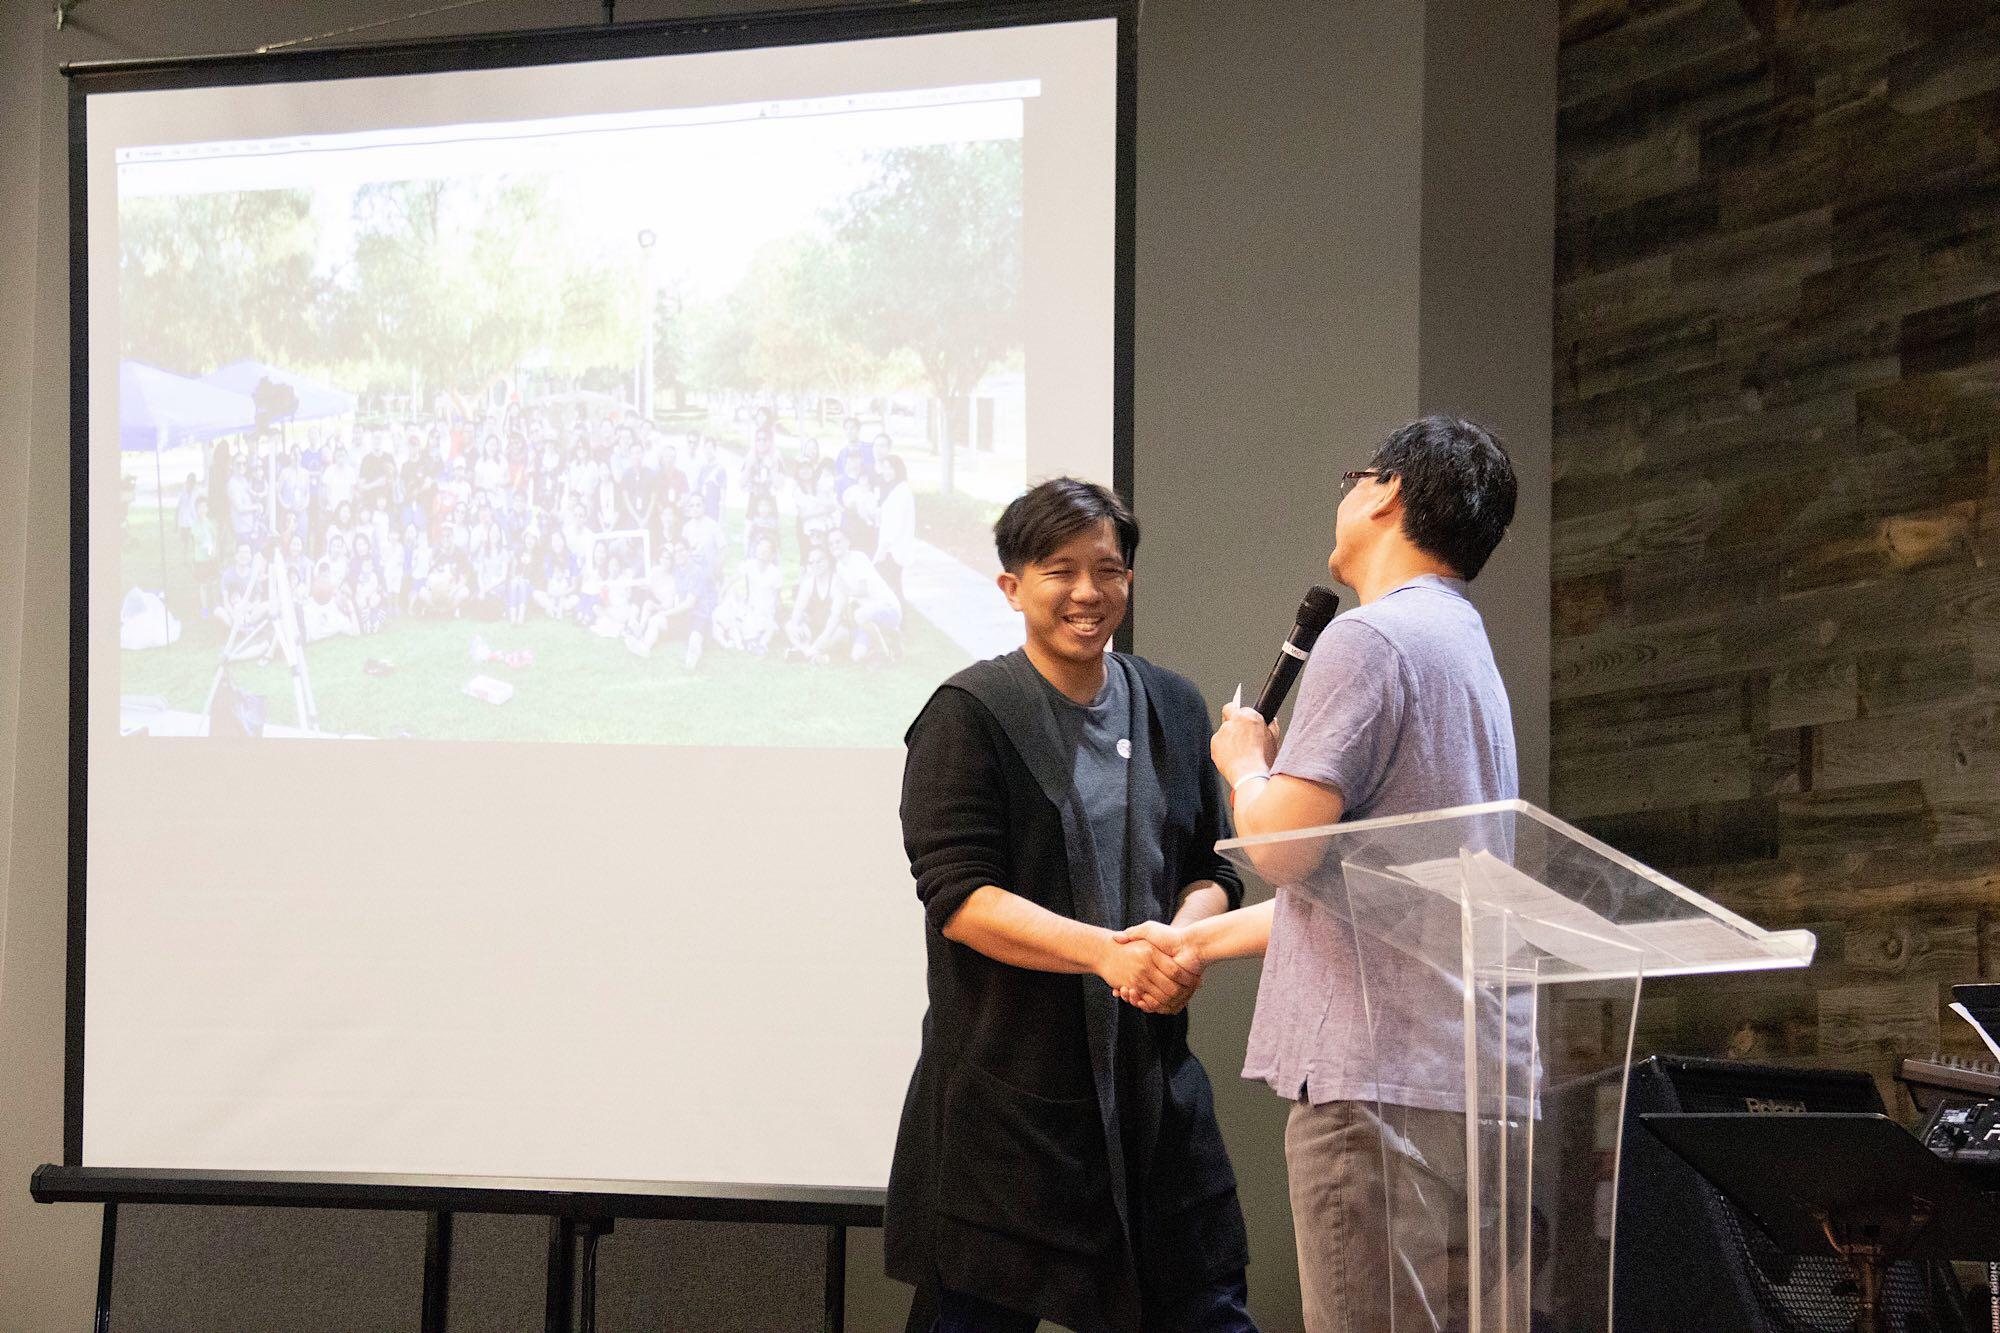 Pastor Ben appreciating Miles for his organizing 1.5G bonding event on 7/13